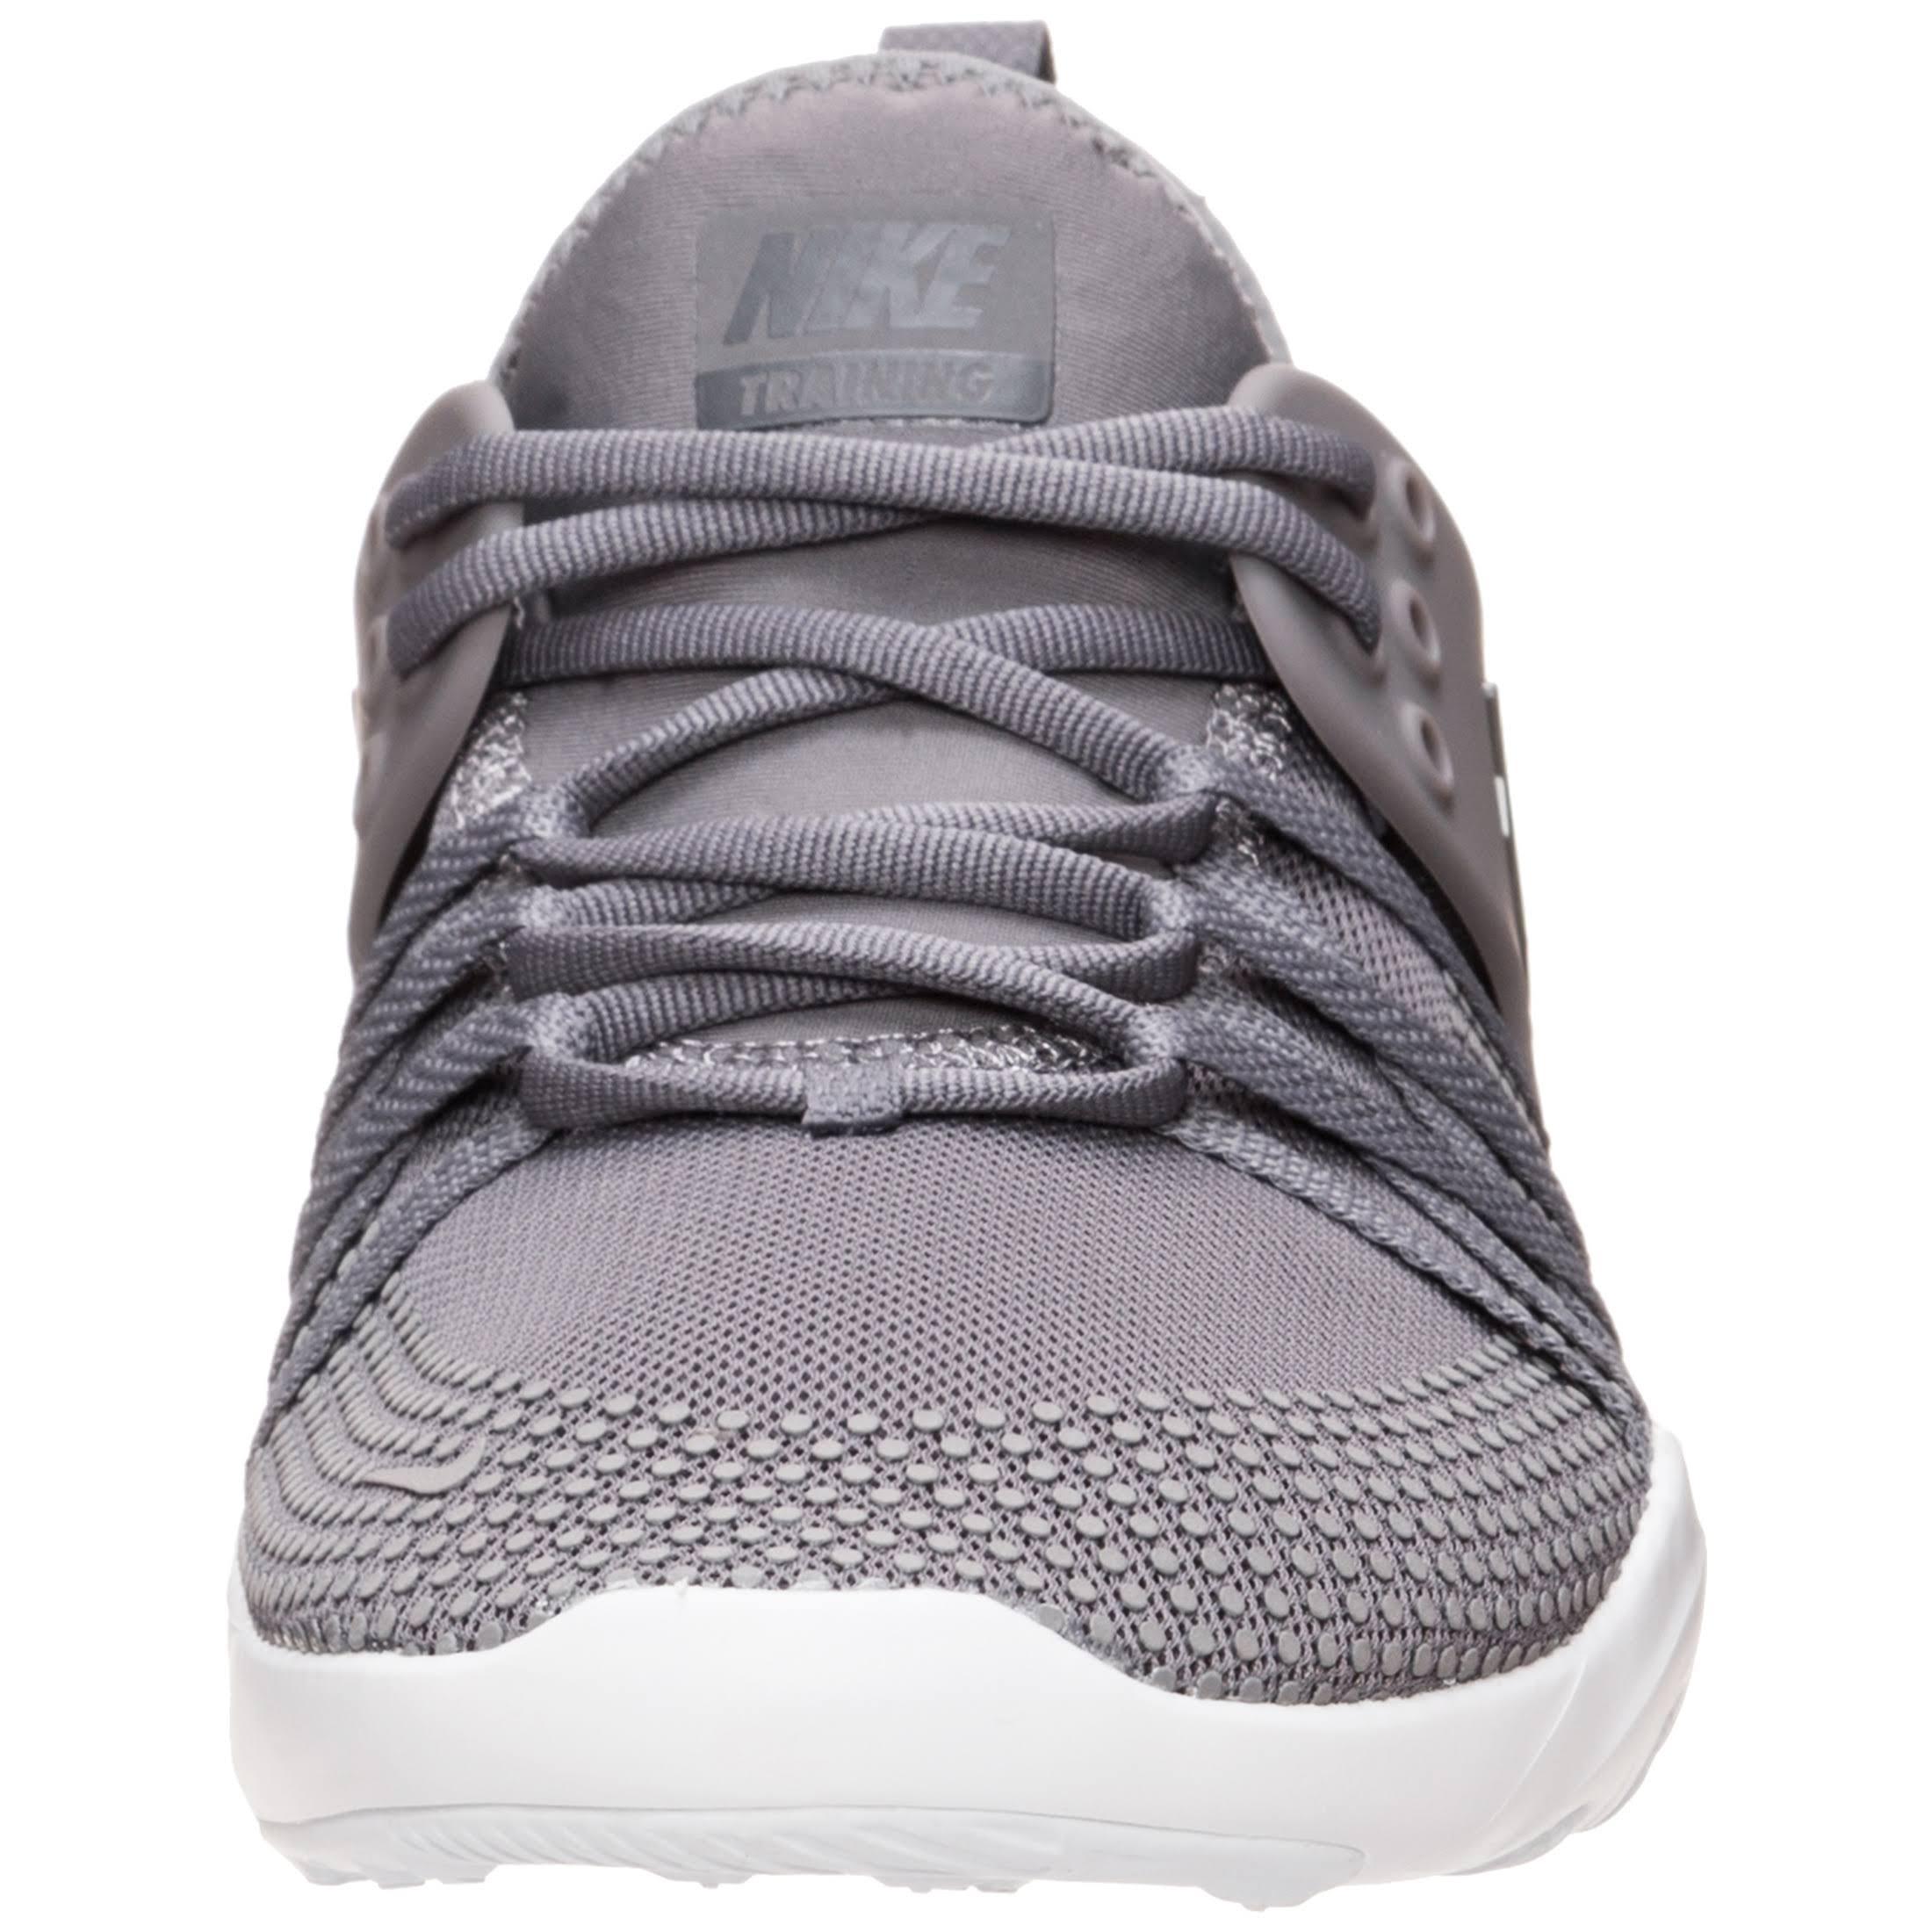 Nike Grau Free Tr7 weiß Grau Fitnessschuh Damen 37 5 raqpvrPw